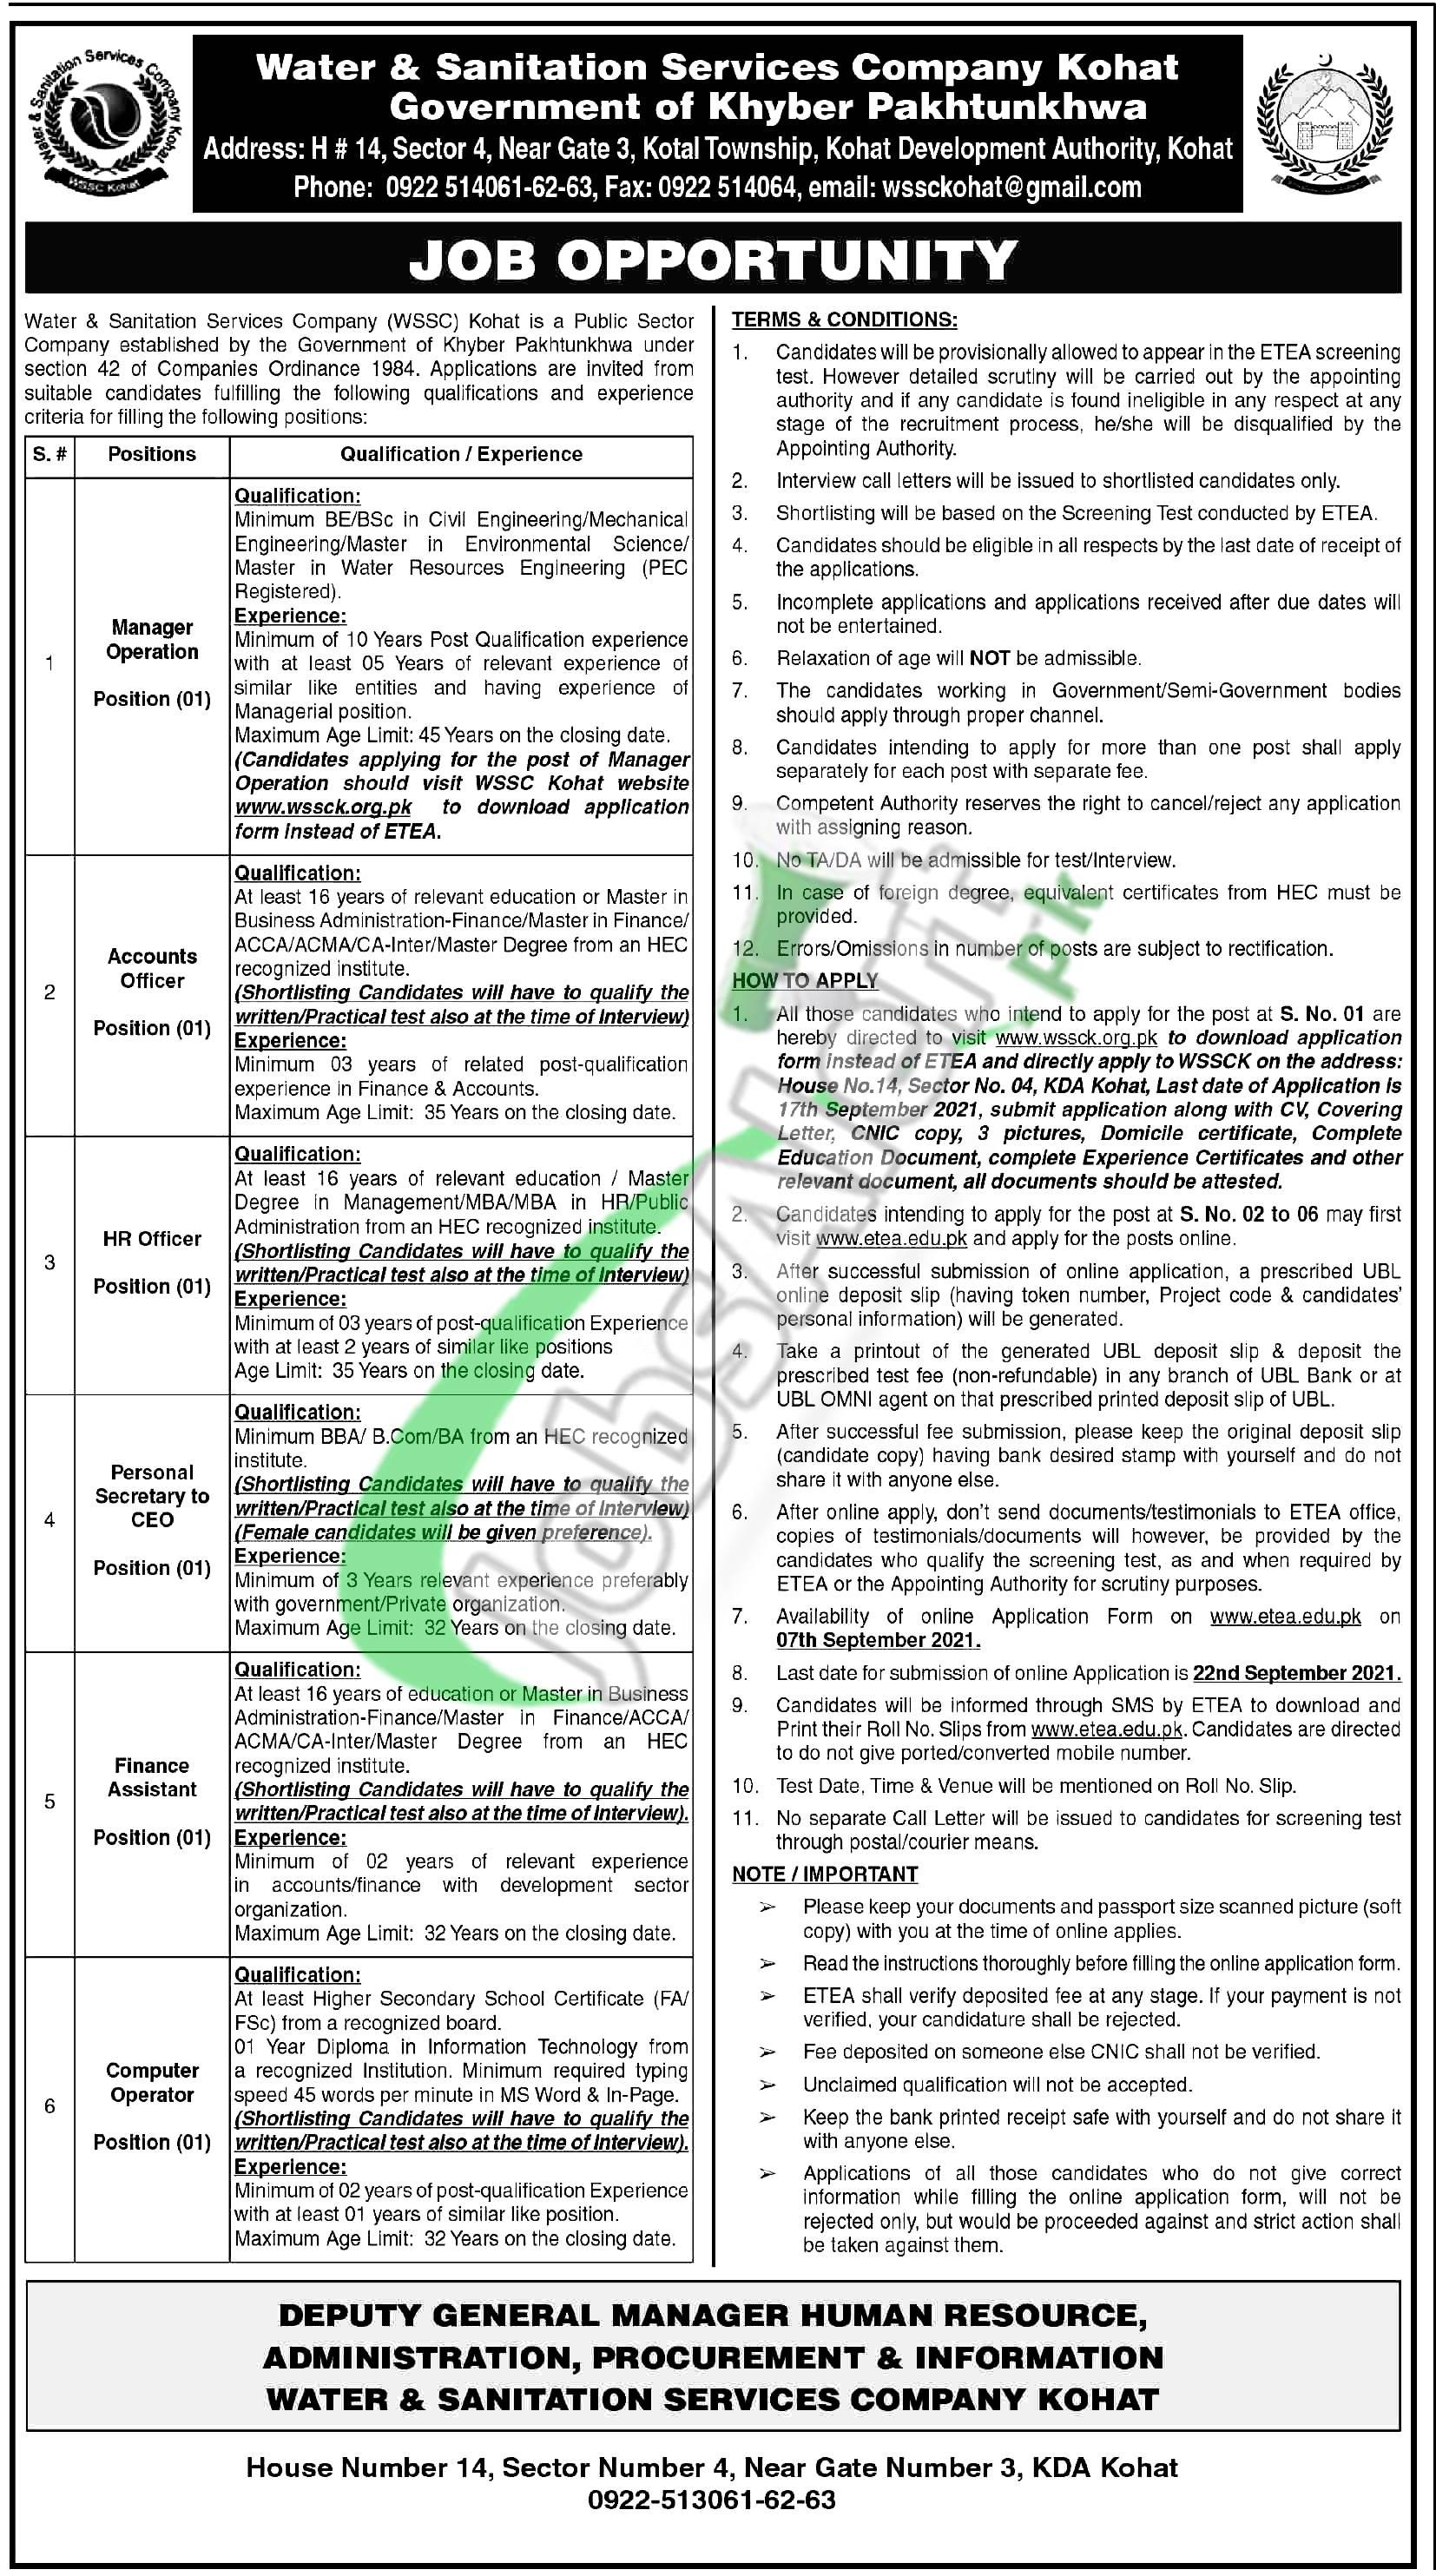 Water & Sanitation Services Company Kohat Jobs